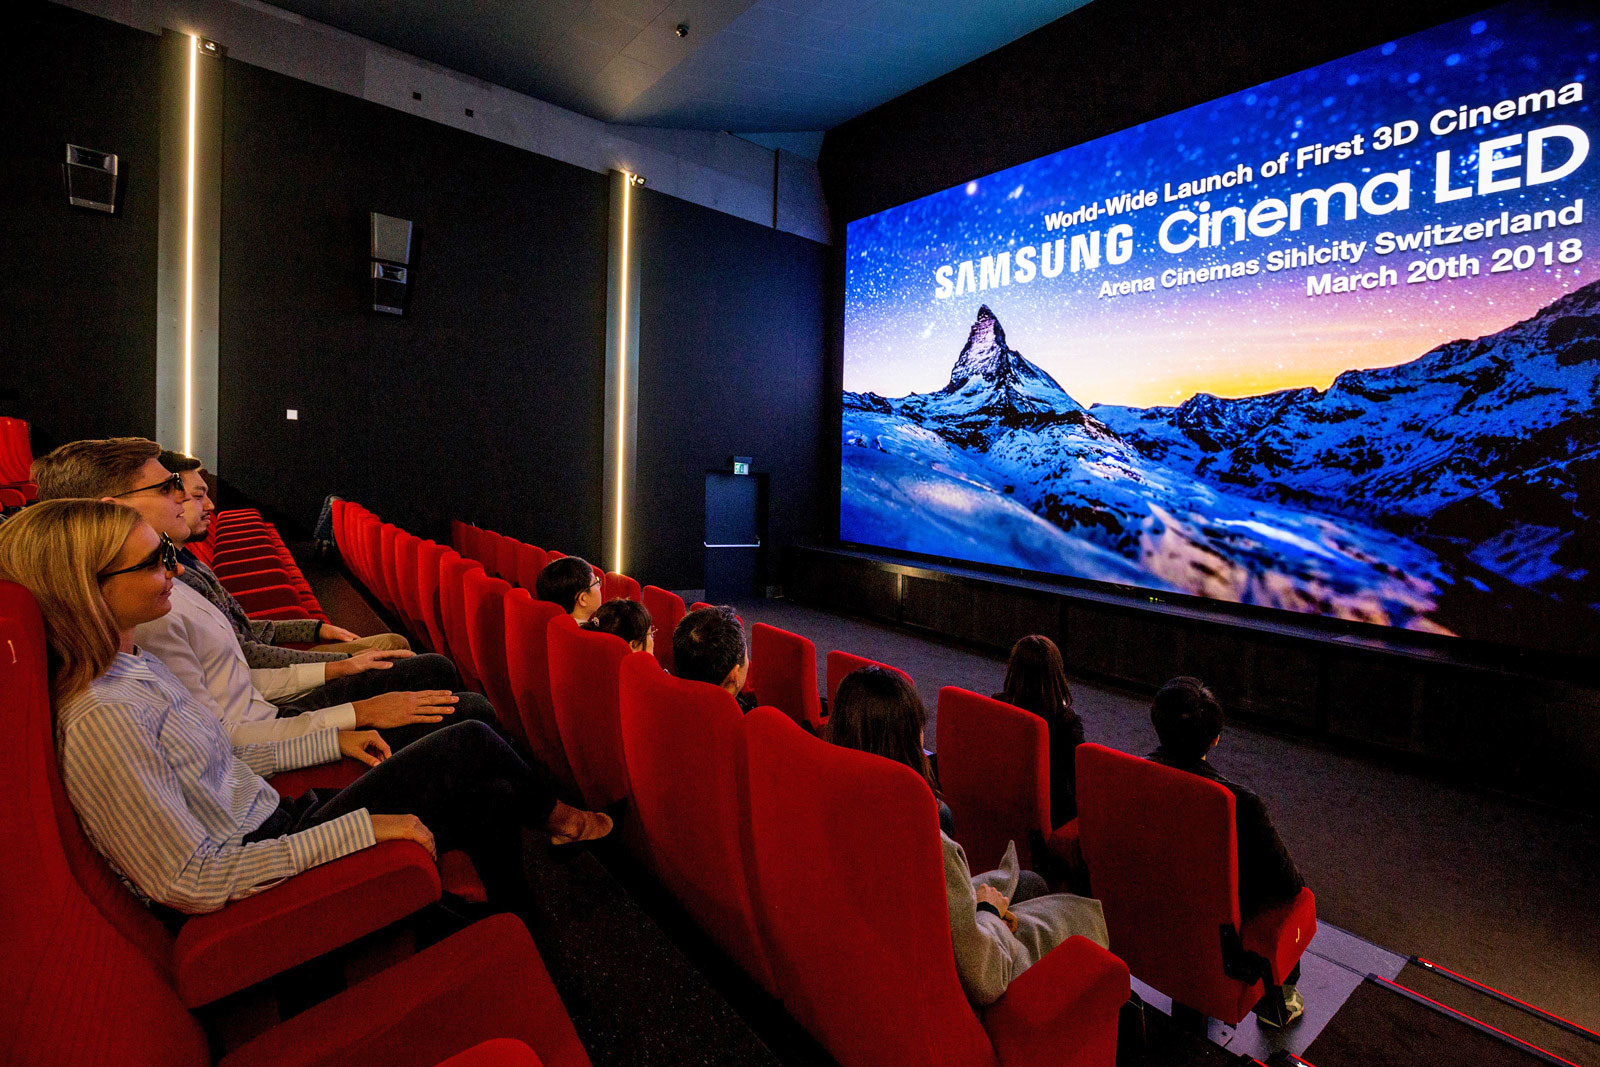 cinema - photo #47